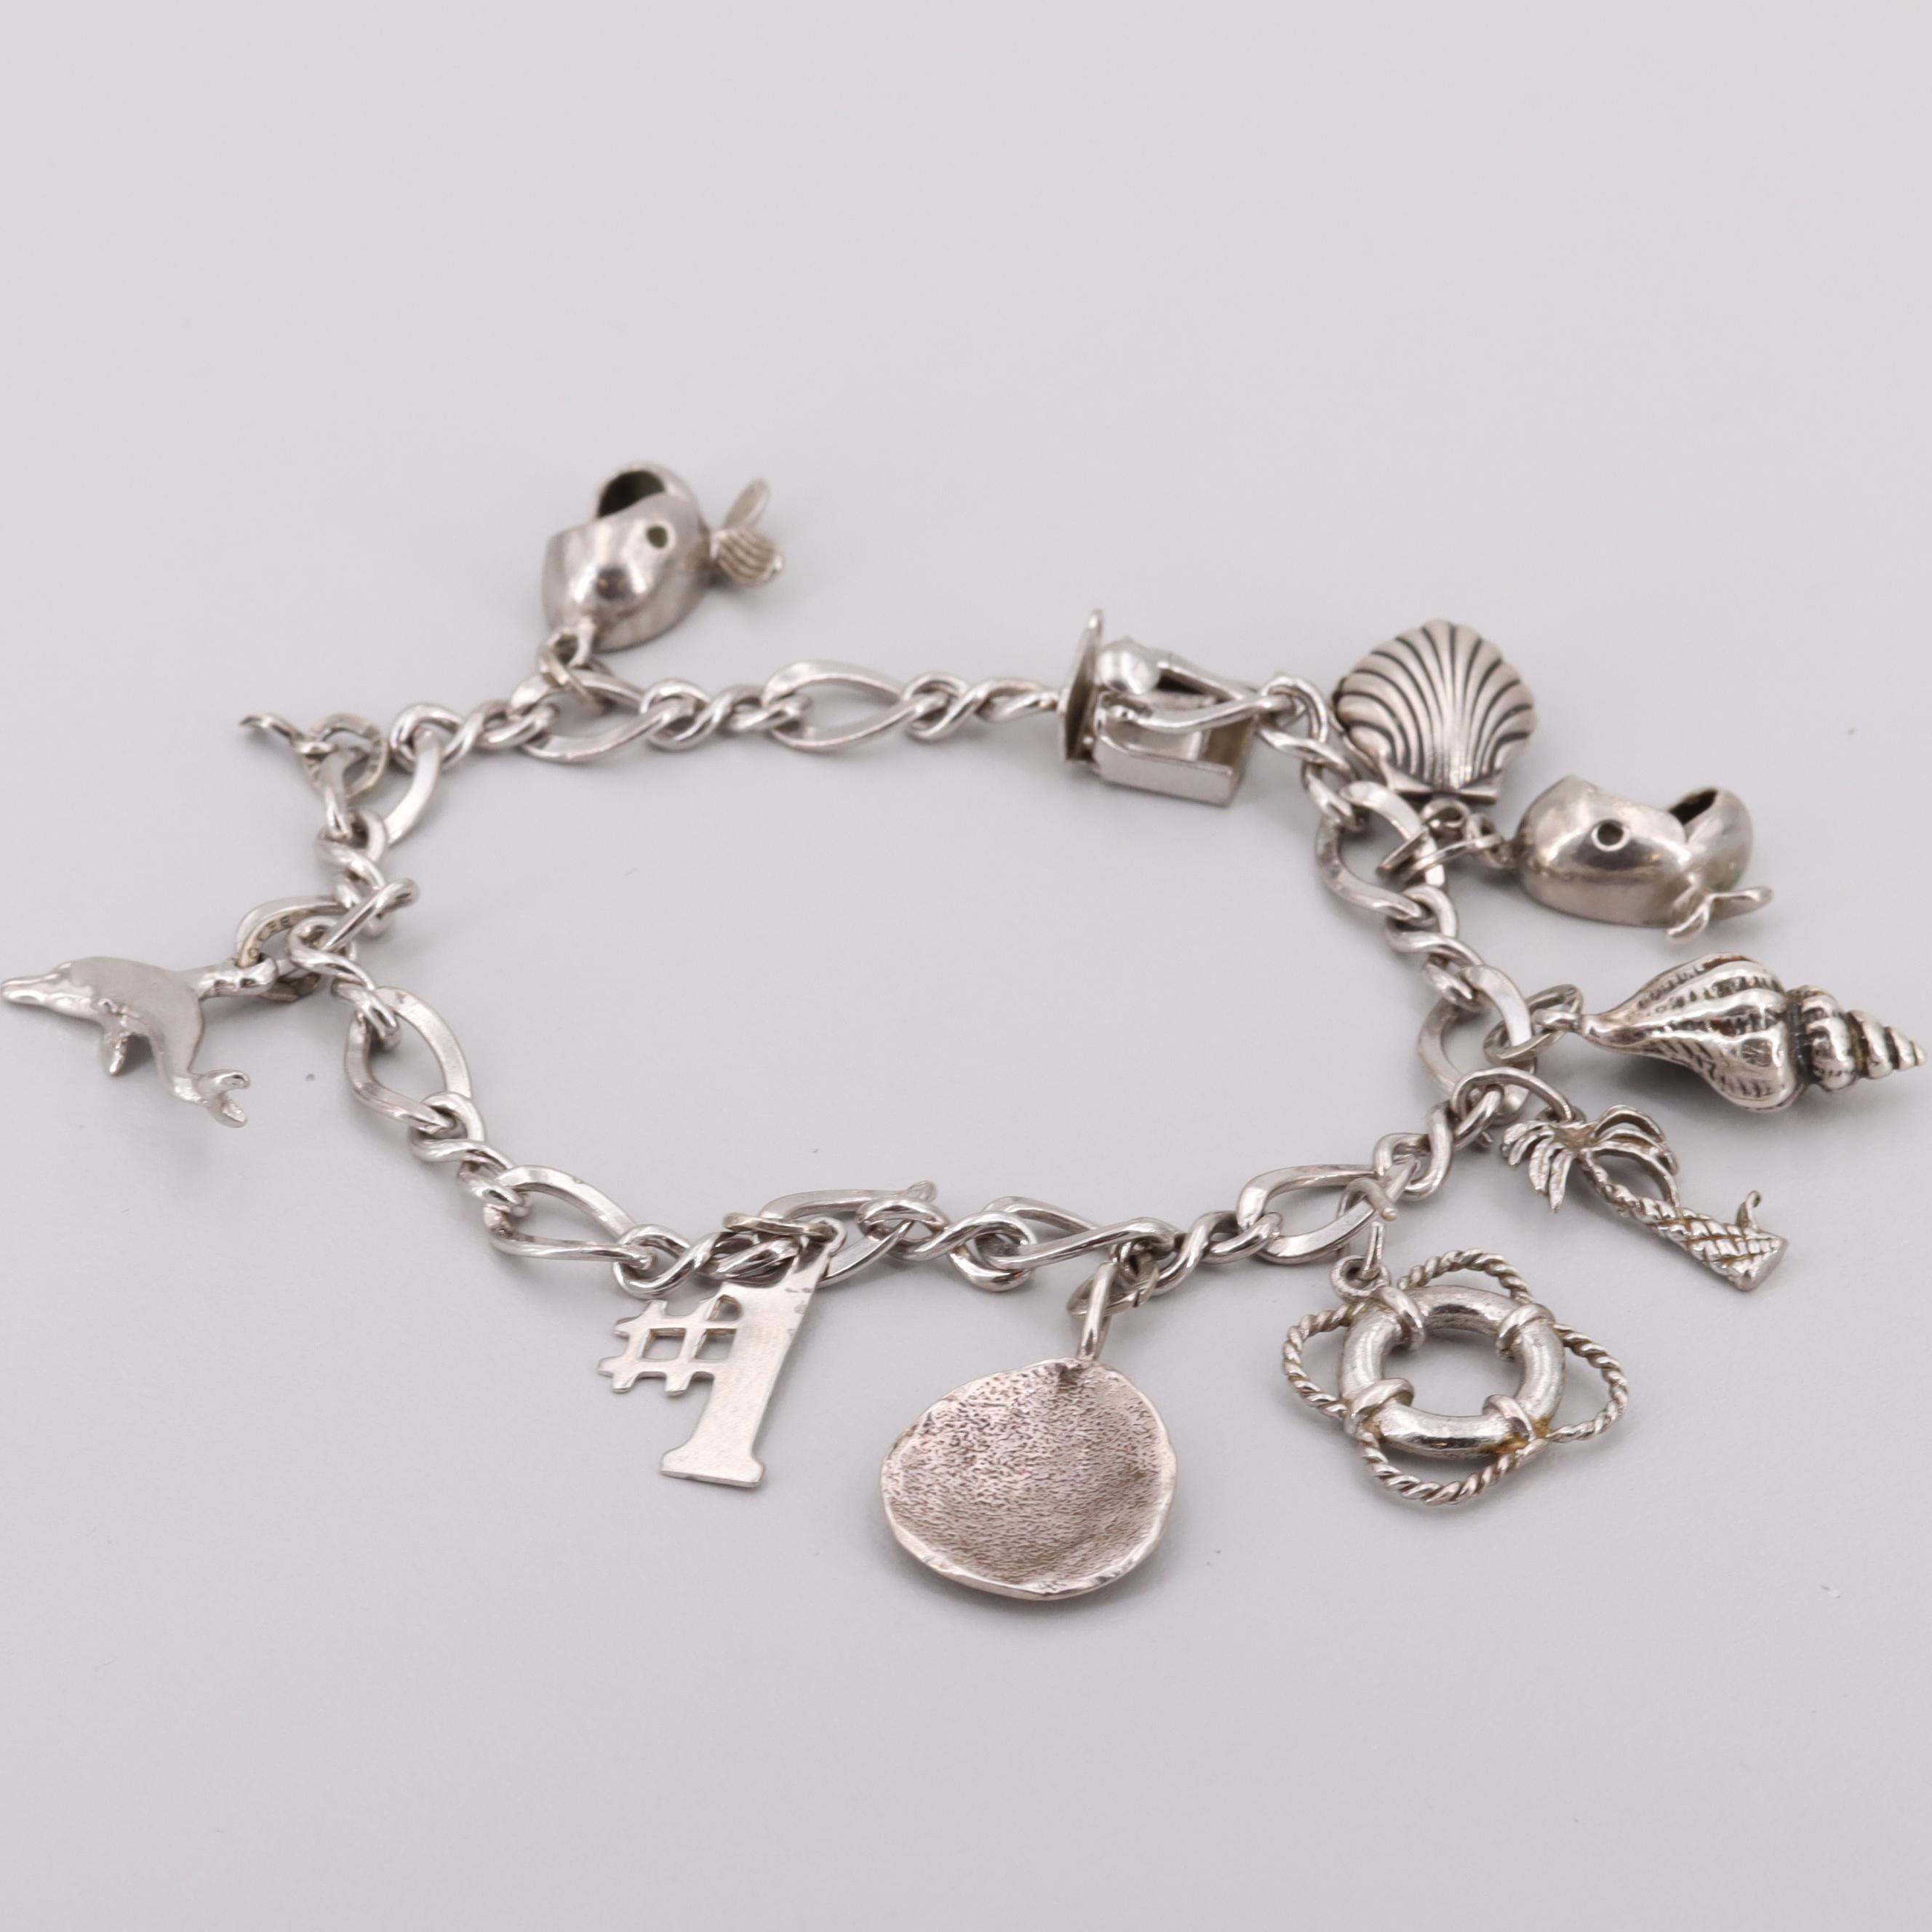 Sterling Silver Charm Bracelet Including Imitation Pearl Charm